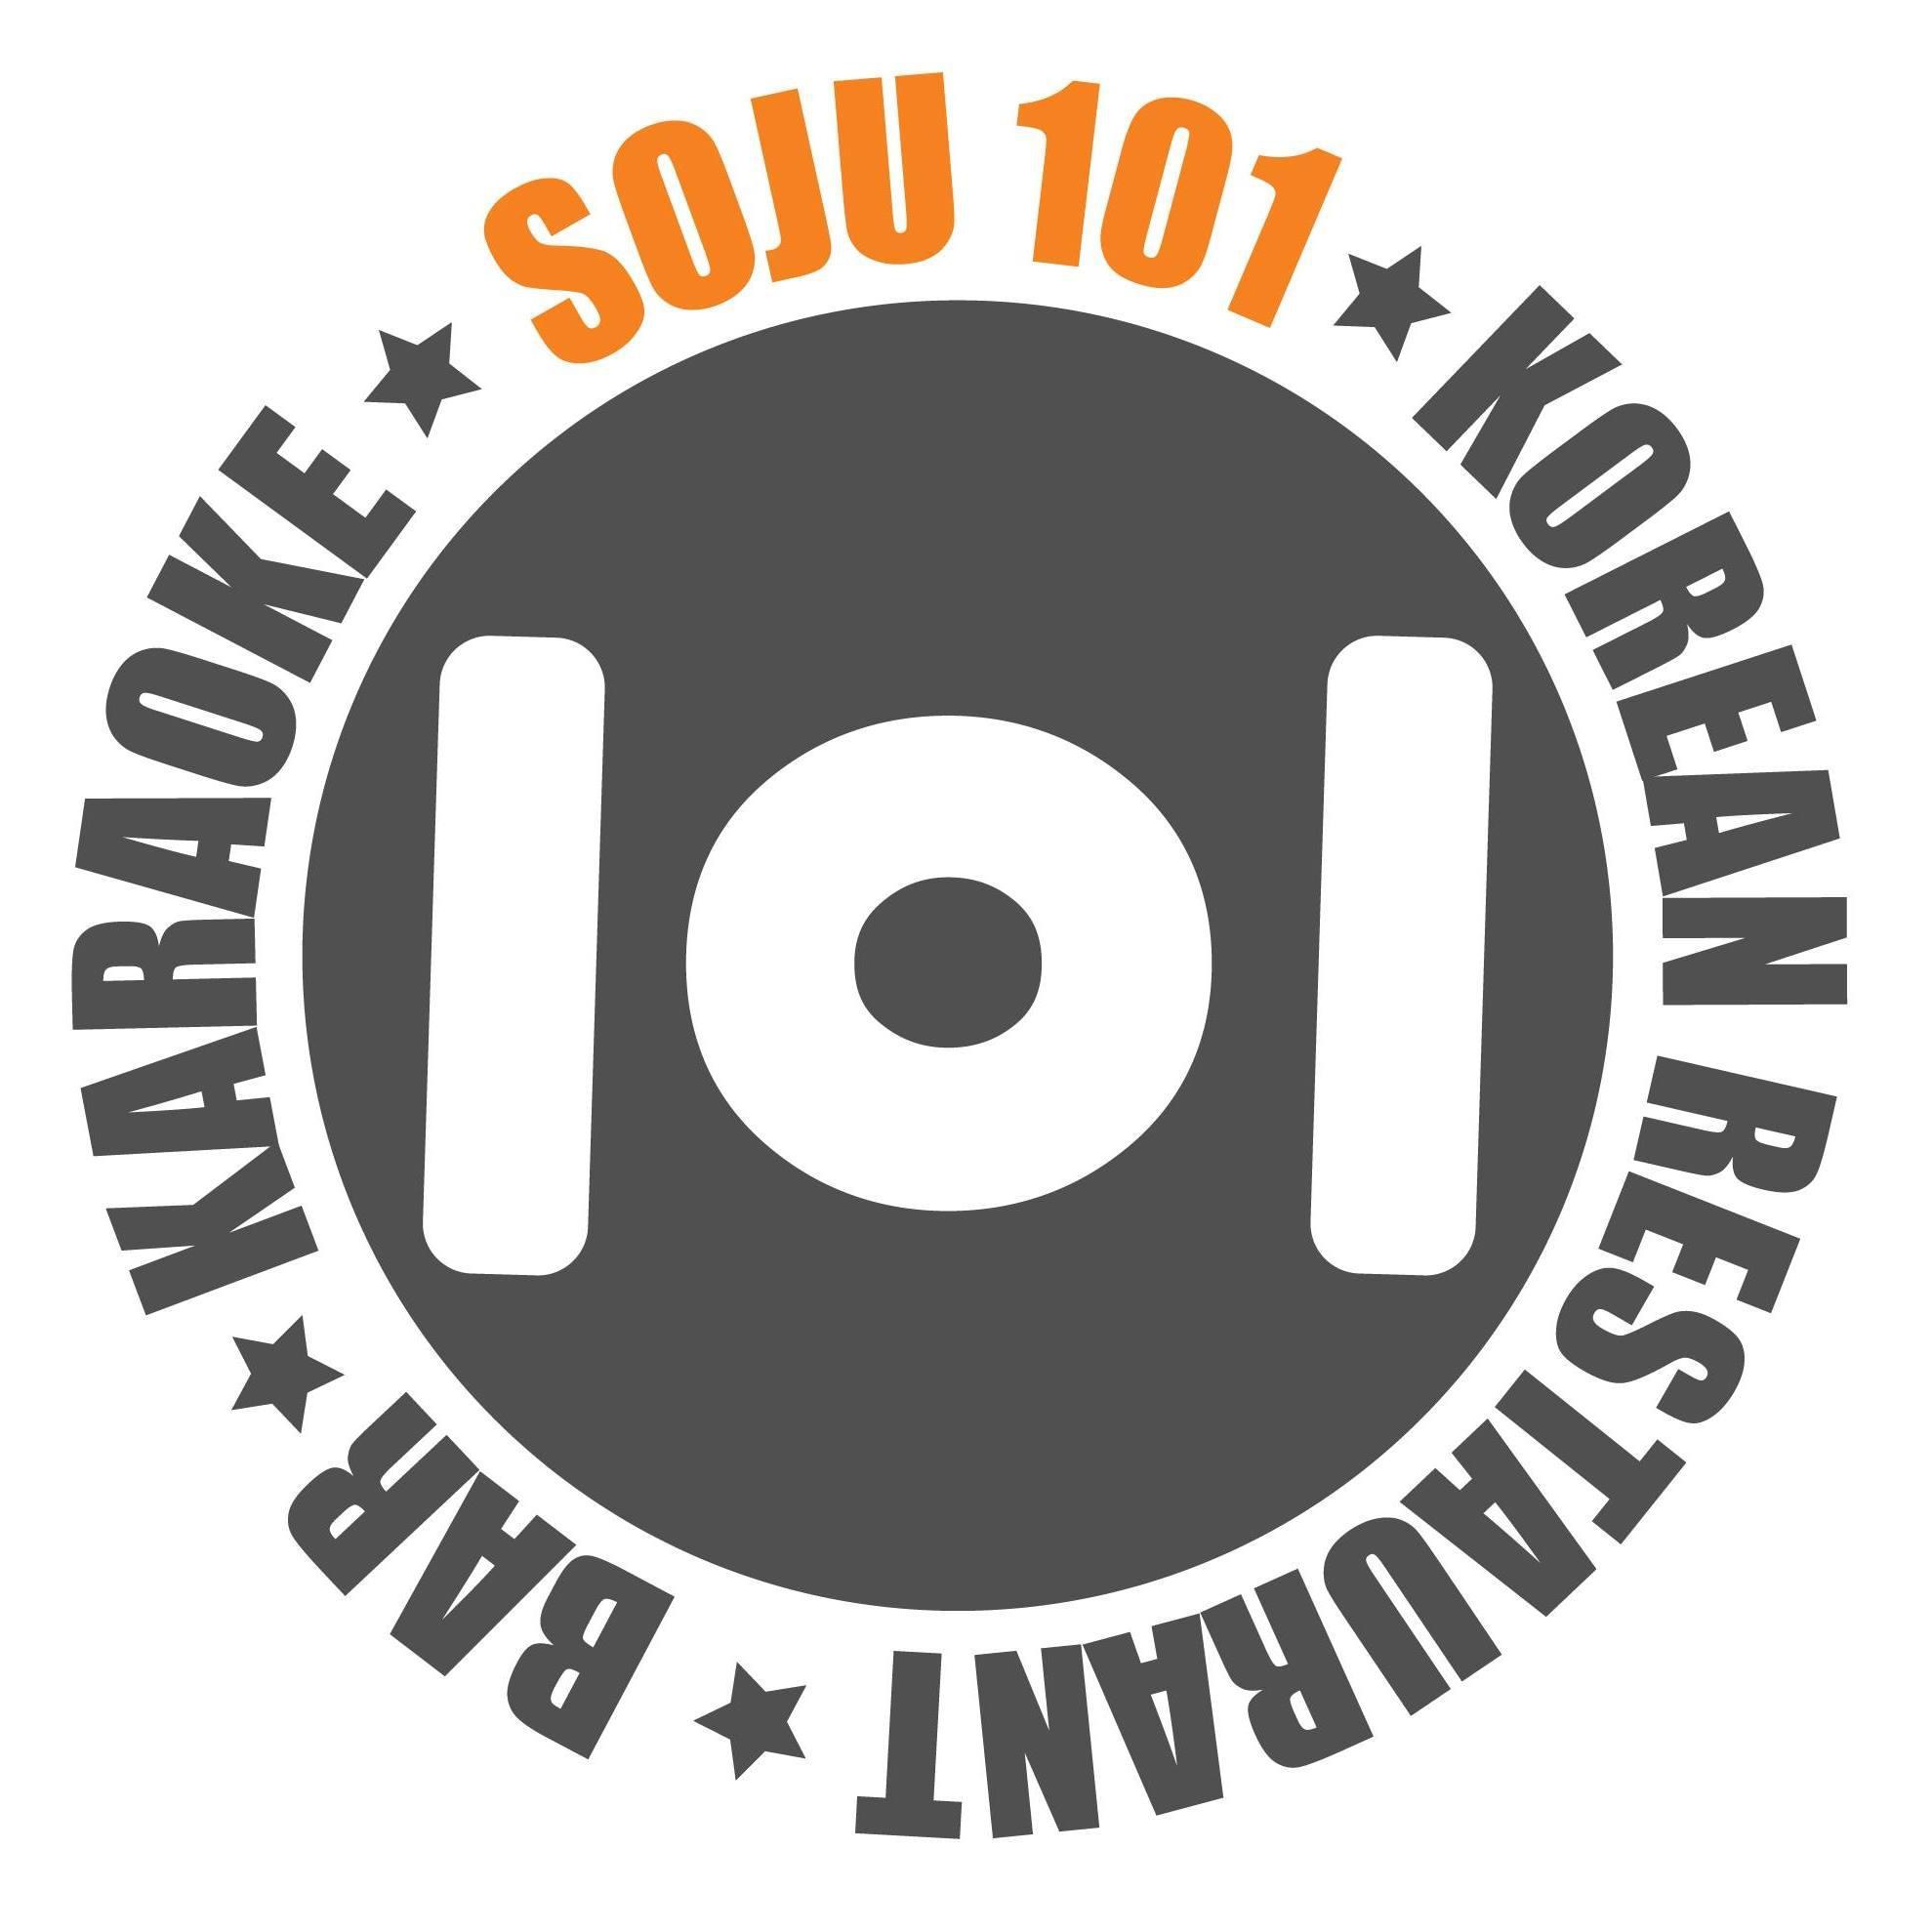 SOJU 101 Bar, Karaoke & Korean Kitchen of Katy Asian Town